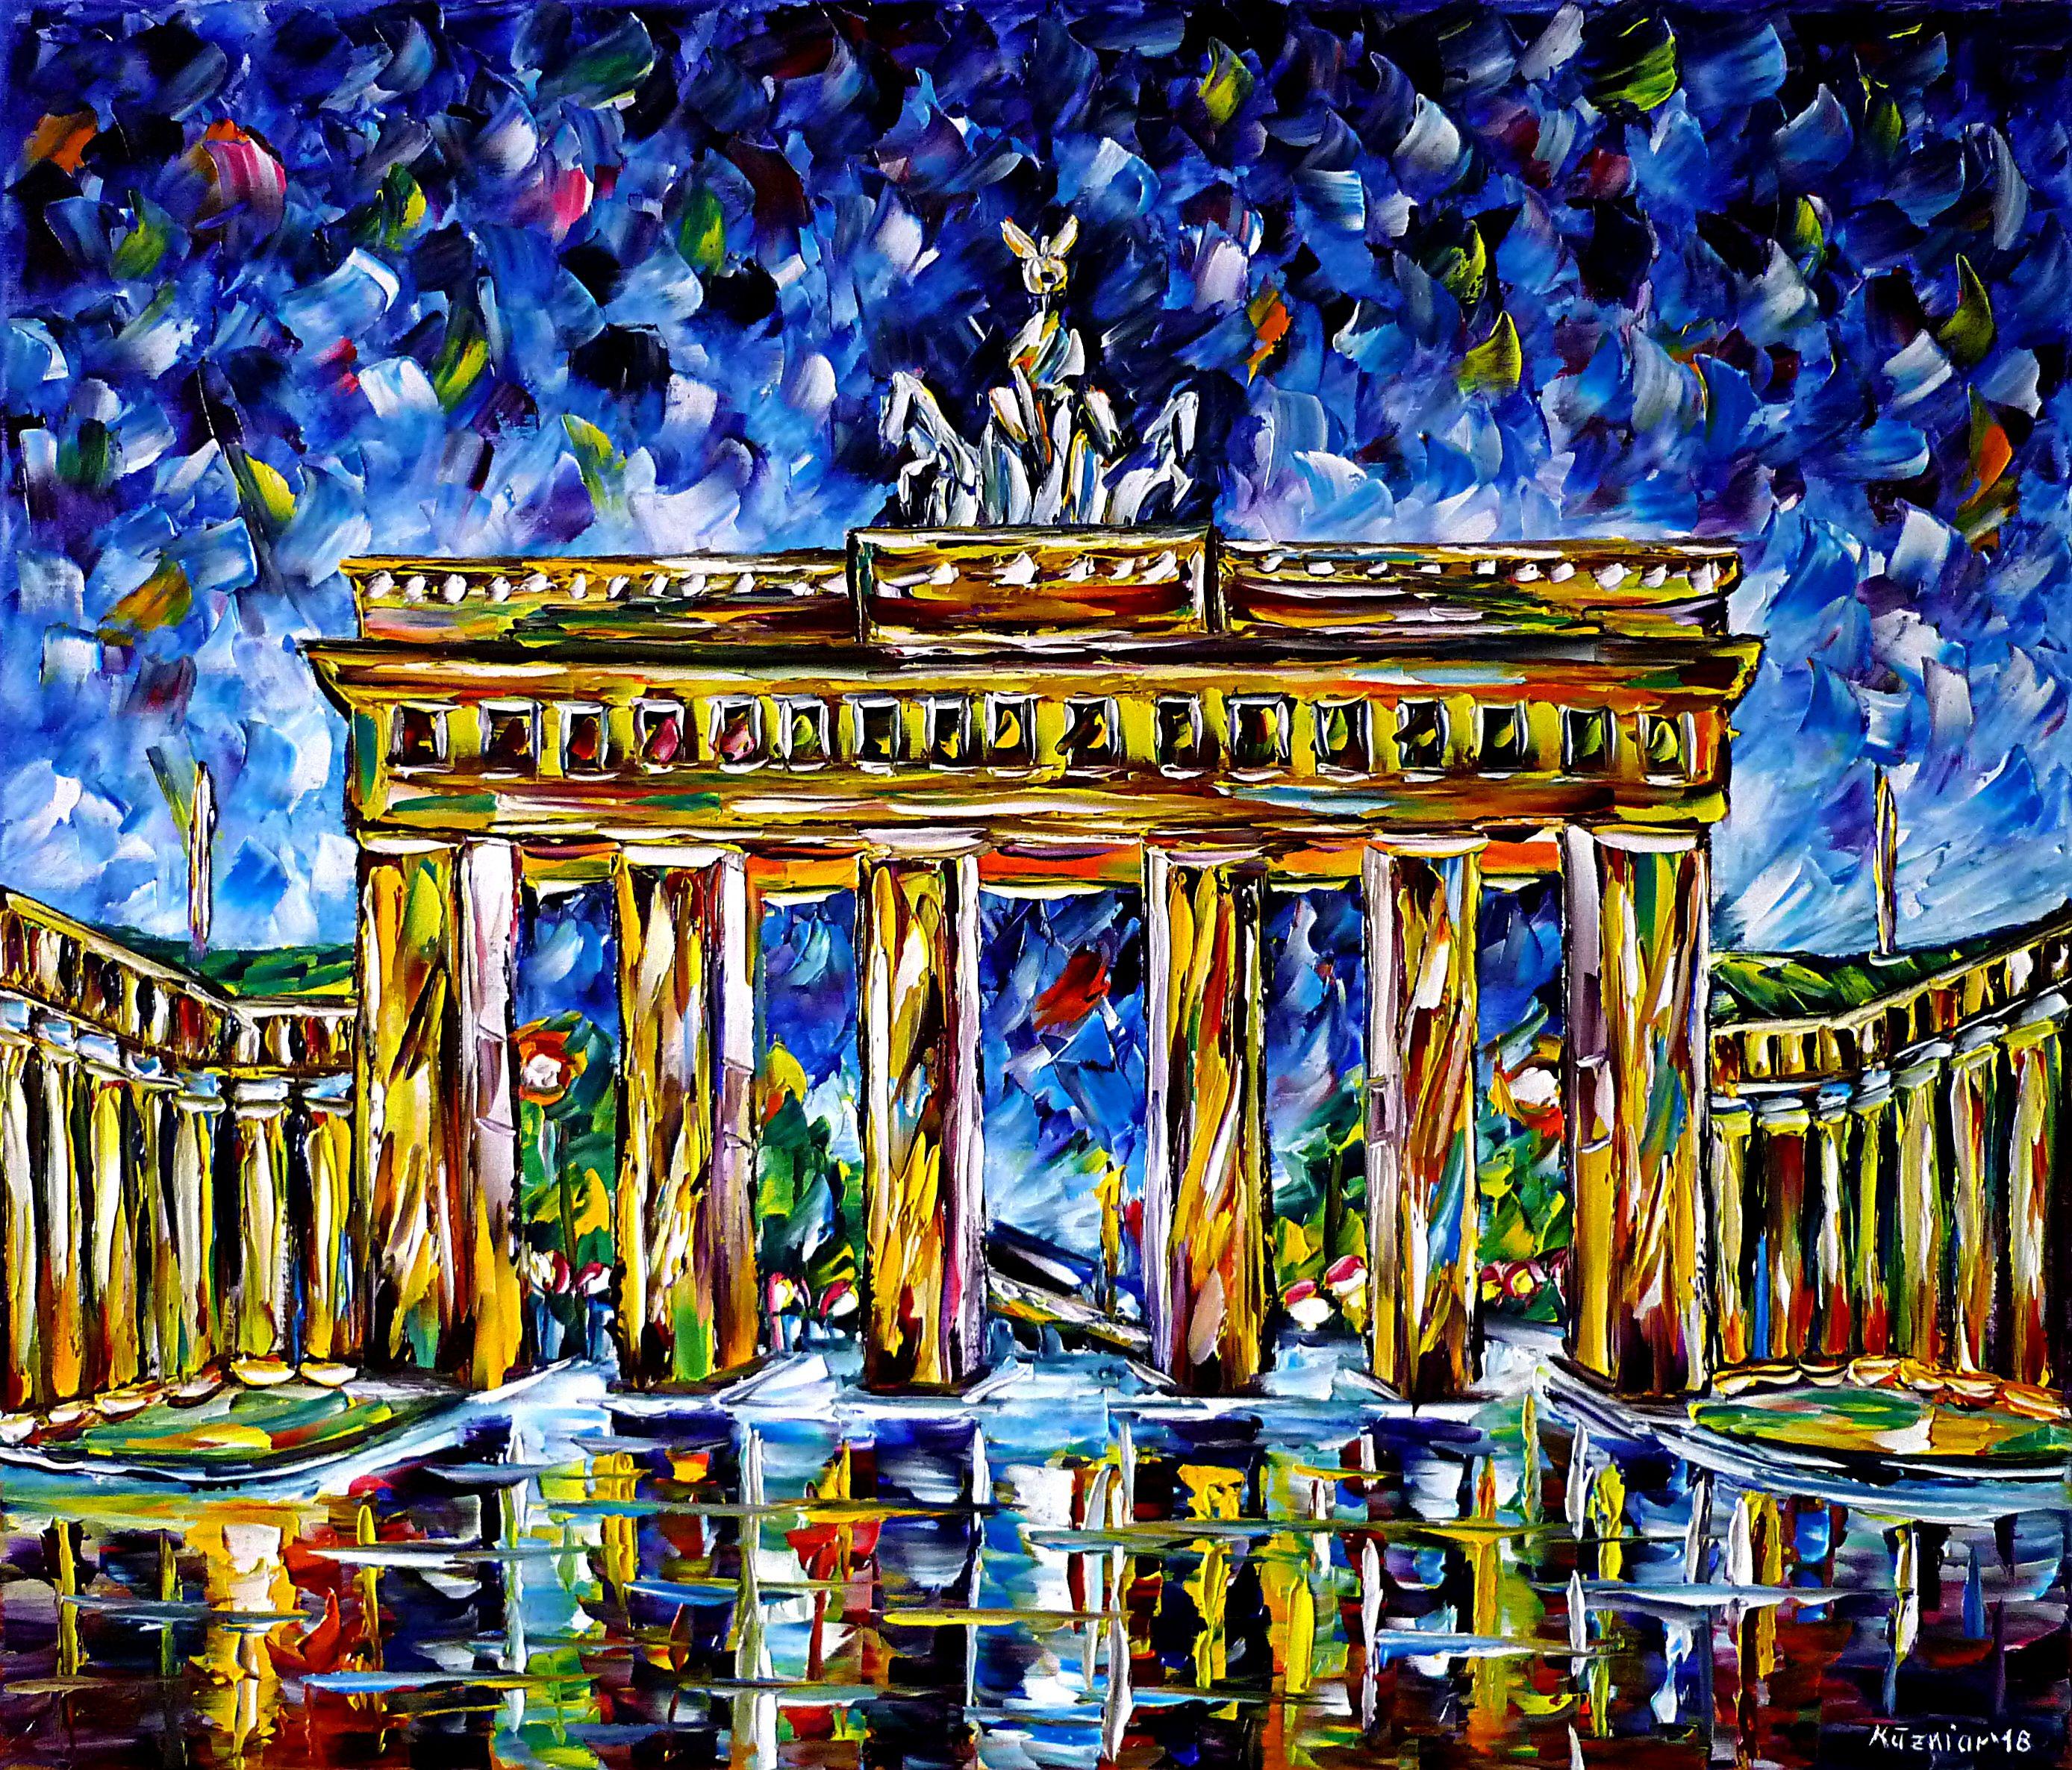 Brandenburger Tor By Mirek Kuzniar Ol Auf Leinwand Spachteltechnik Impressionismus Olmalerei Stadtlandschaft Modernema Idee Farbe Kunst Ideen Olmalerei